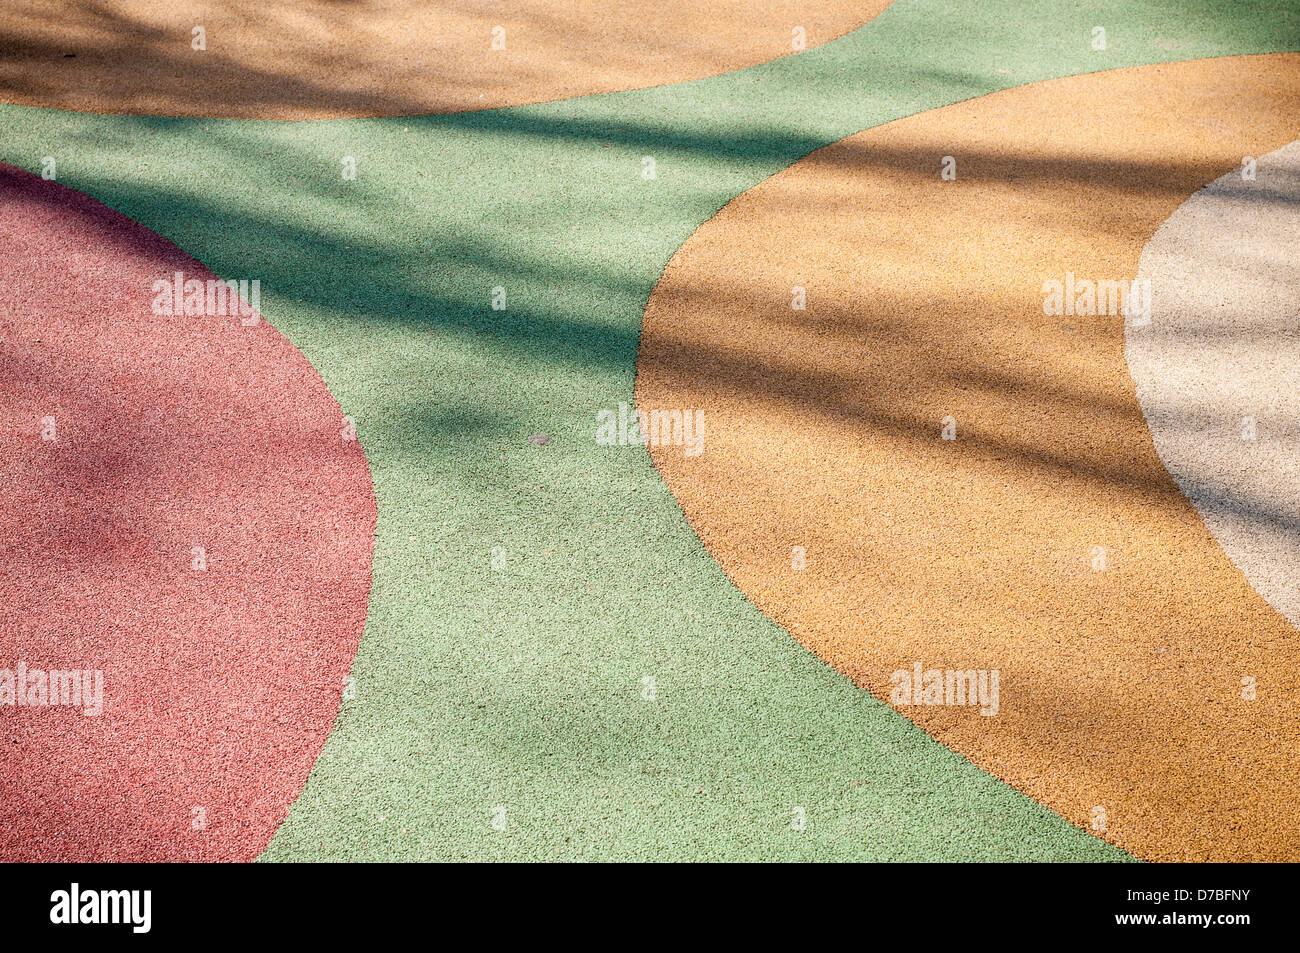 coloroful background pattern - Stock Image